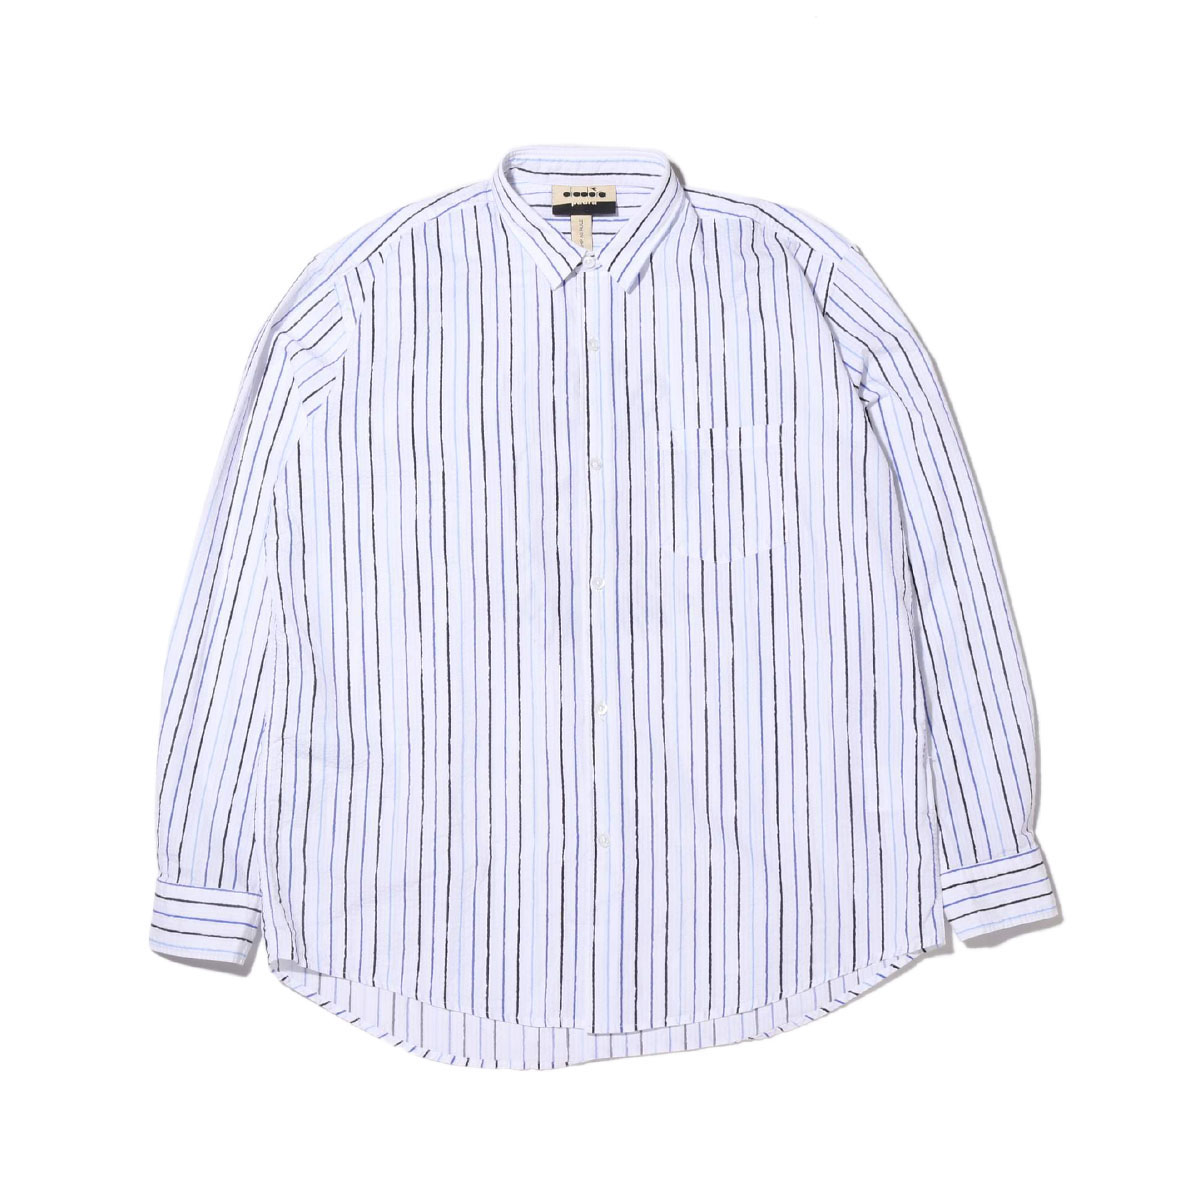 DIADORA PAURA LOGO SHIRT(OPTICAL WHITE)(ディアドラ パウラロゴシャツ)【メンズ】【半袖Tシャツ】【20SP-S】